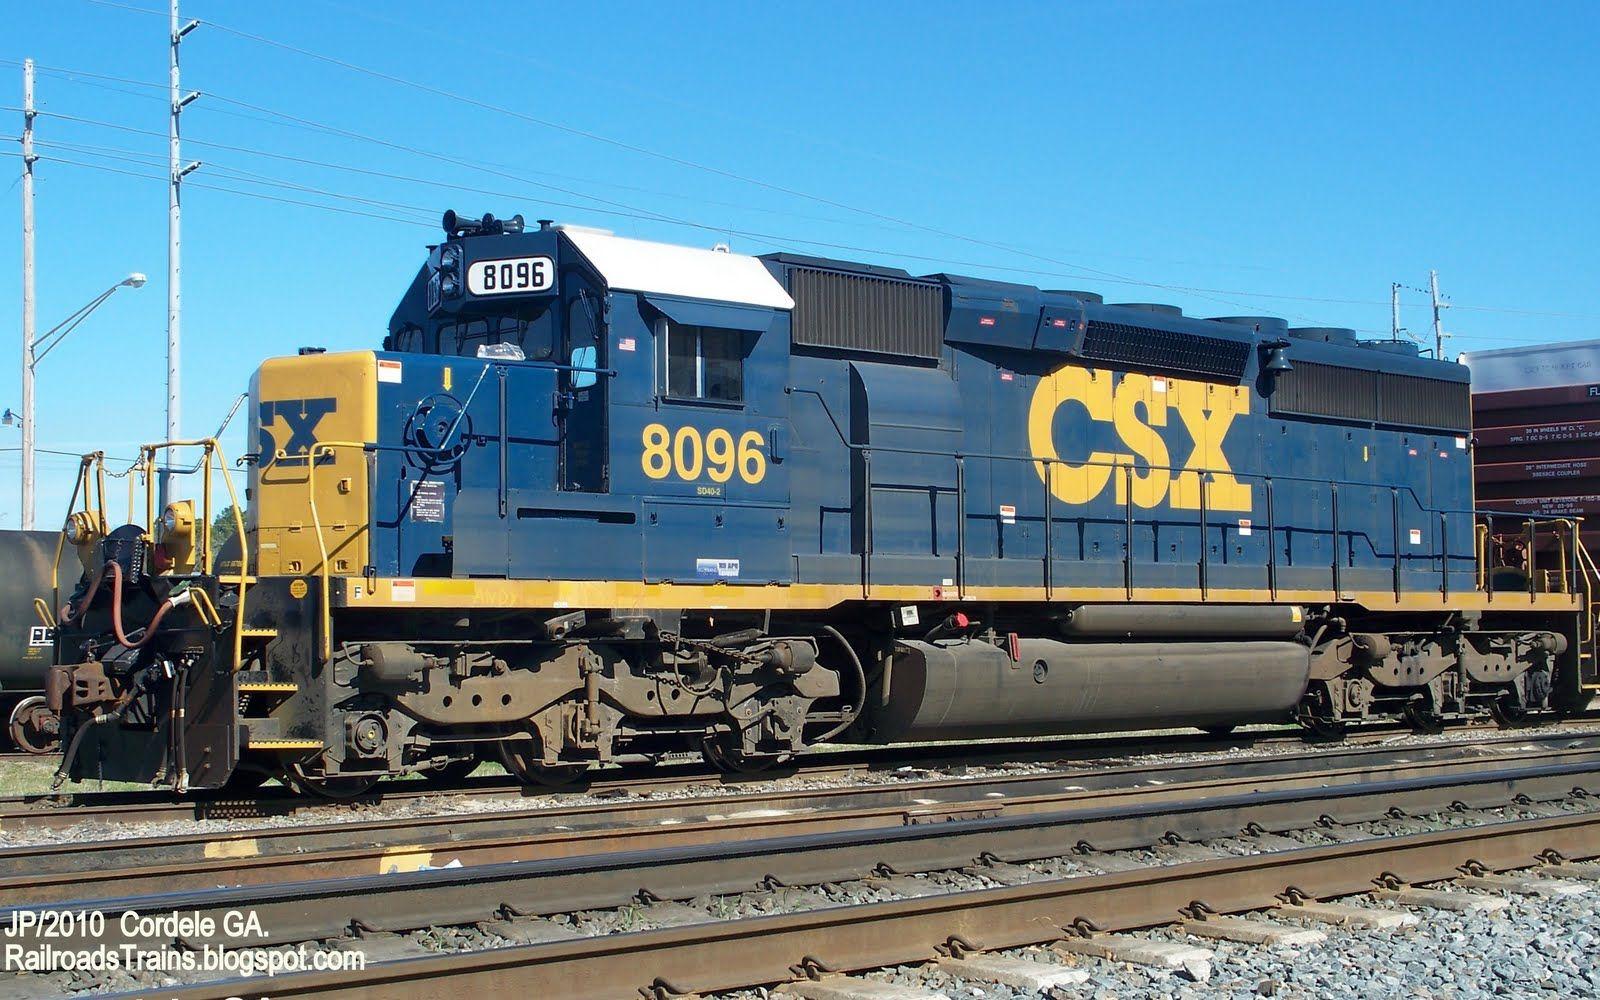 Csx Sd40 2 Csx Railroad Locomotive Train Engine